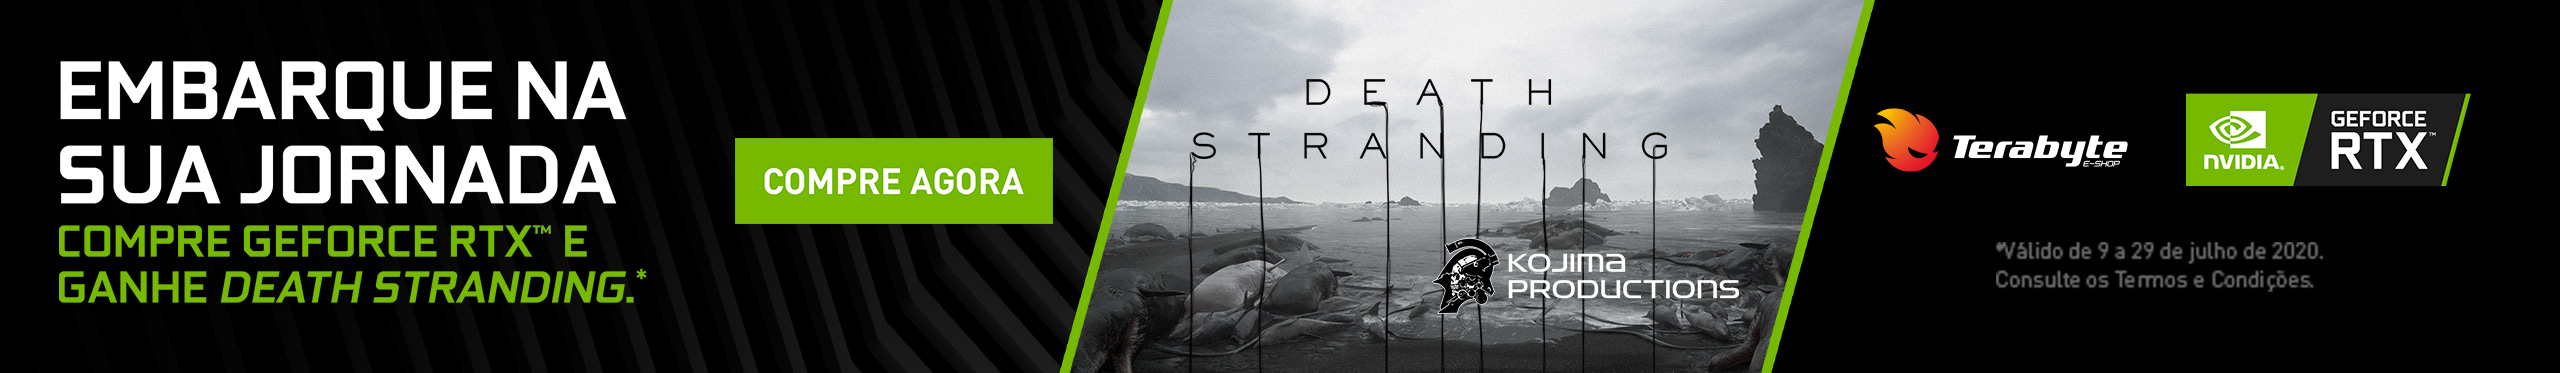 RTX - Death Stranding